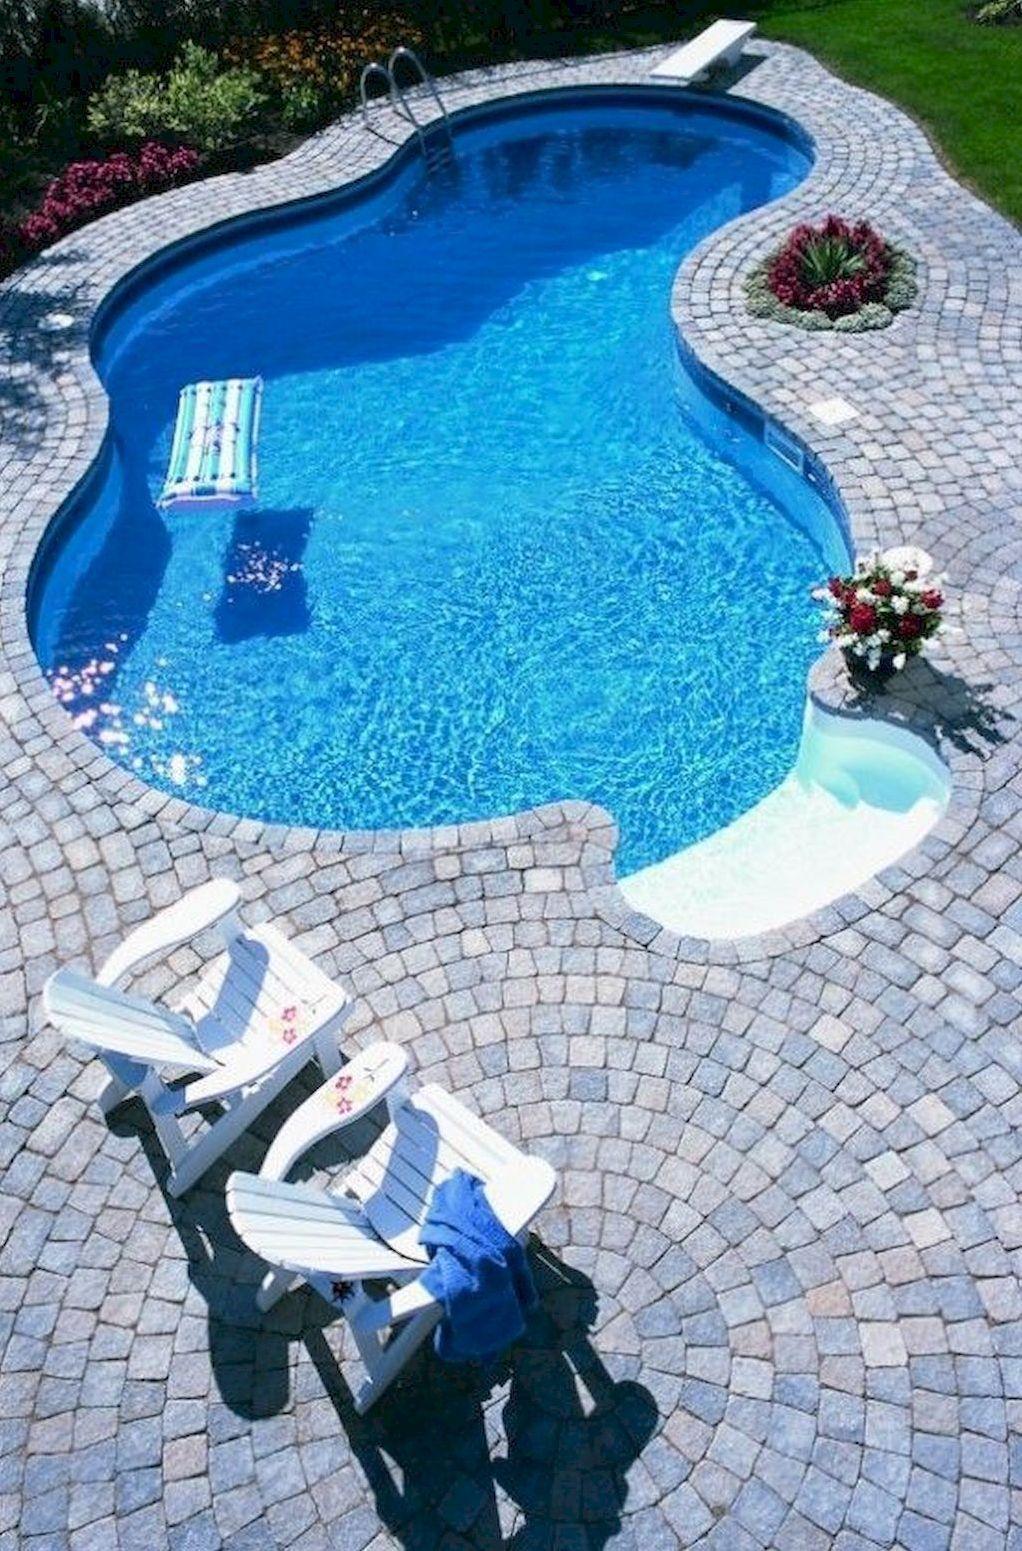 6 Incredible Backyard Swimming Pool Design Ideas Futurian Backyard Pool Designs Cool Swimming Pools Small Backyard Pools